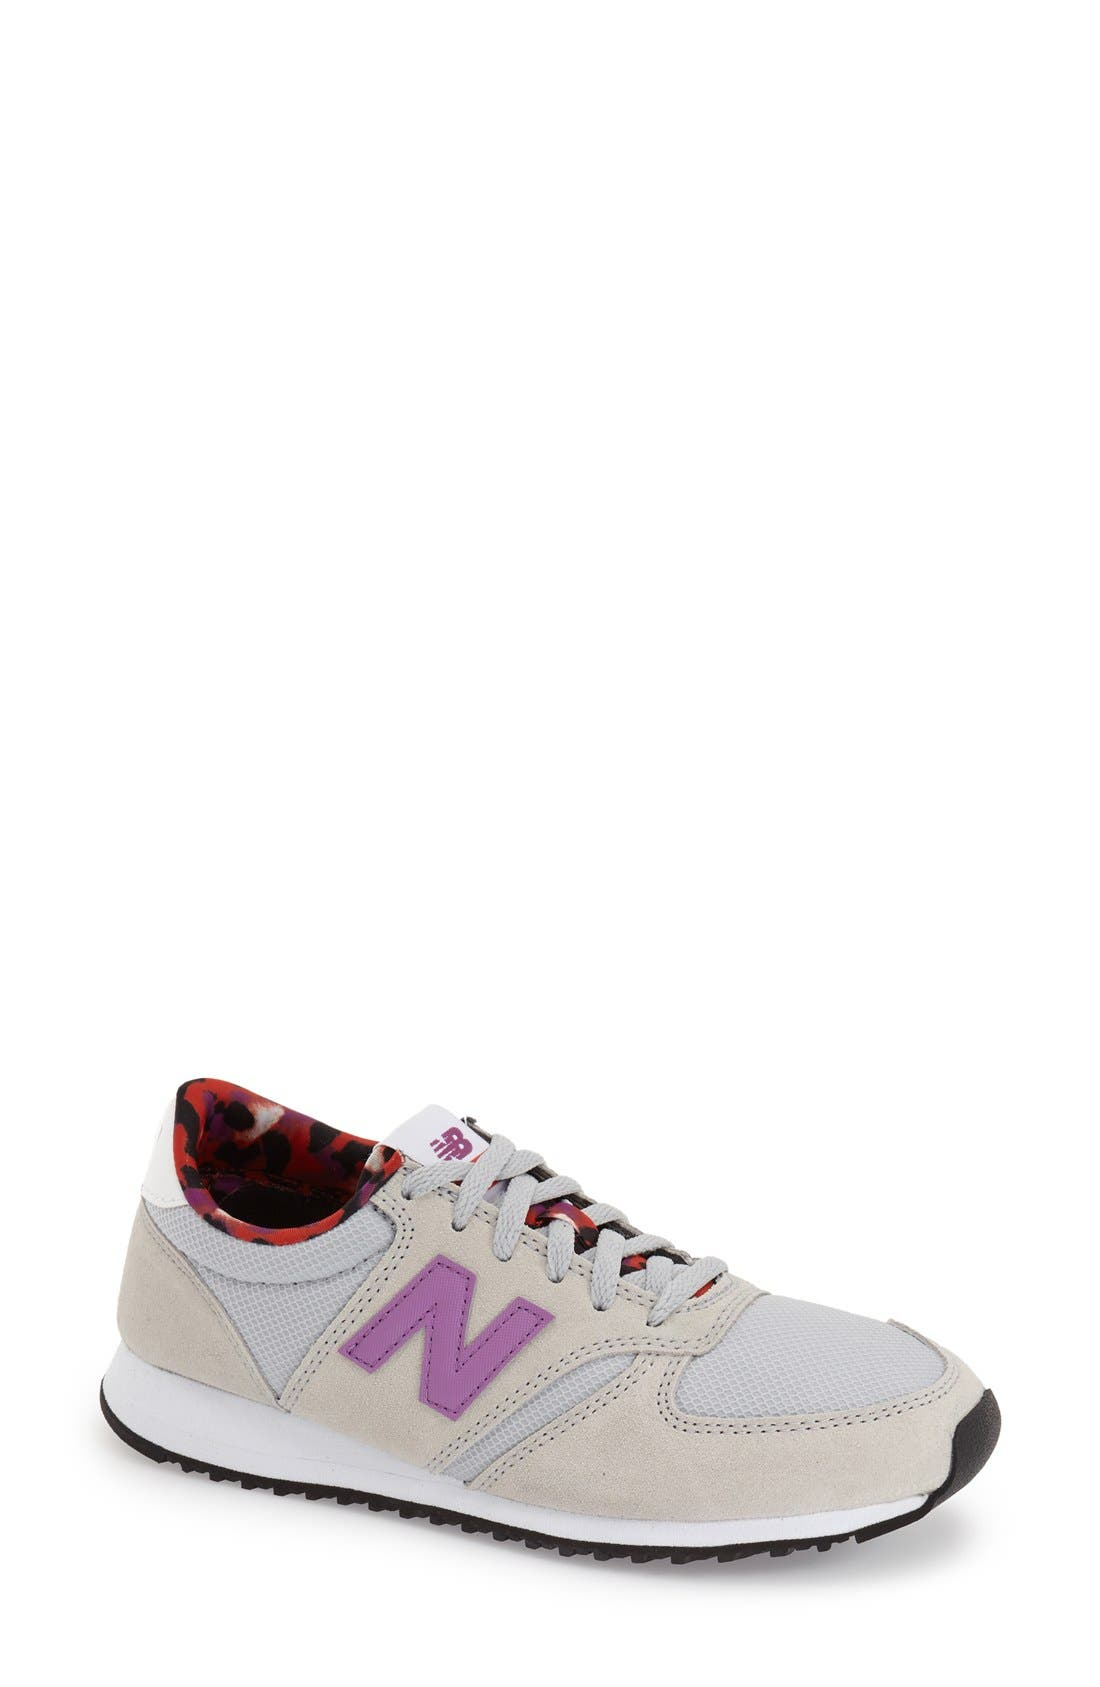 Alternate Image 1 Selected - New Balance '420' Sneaker (Women)